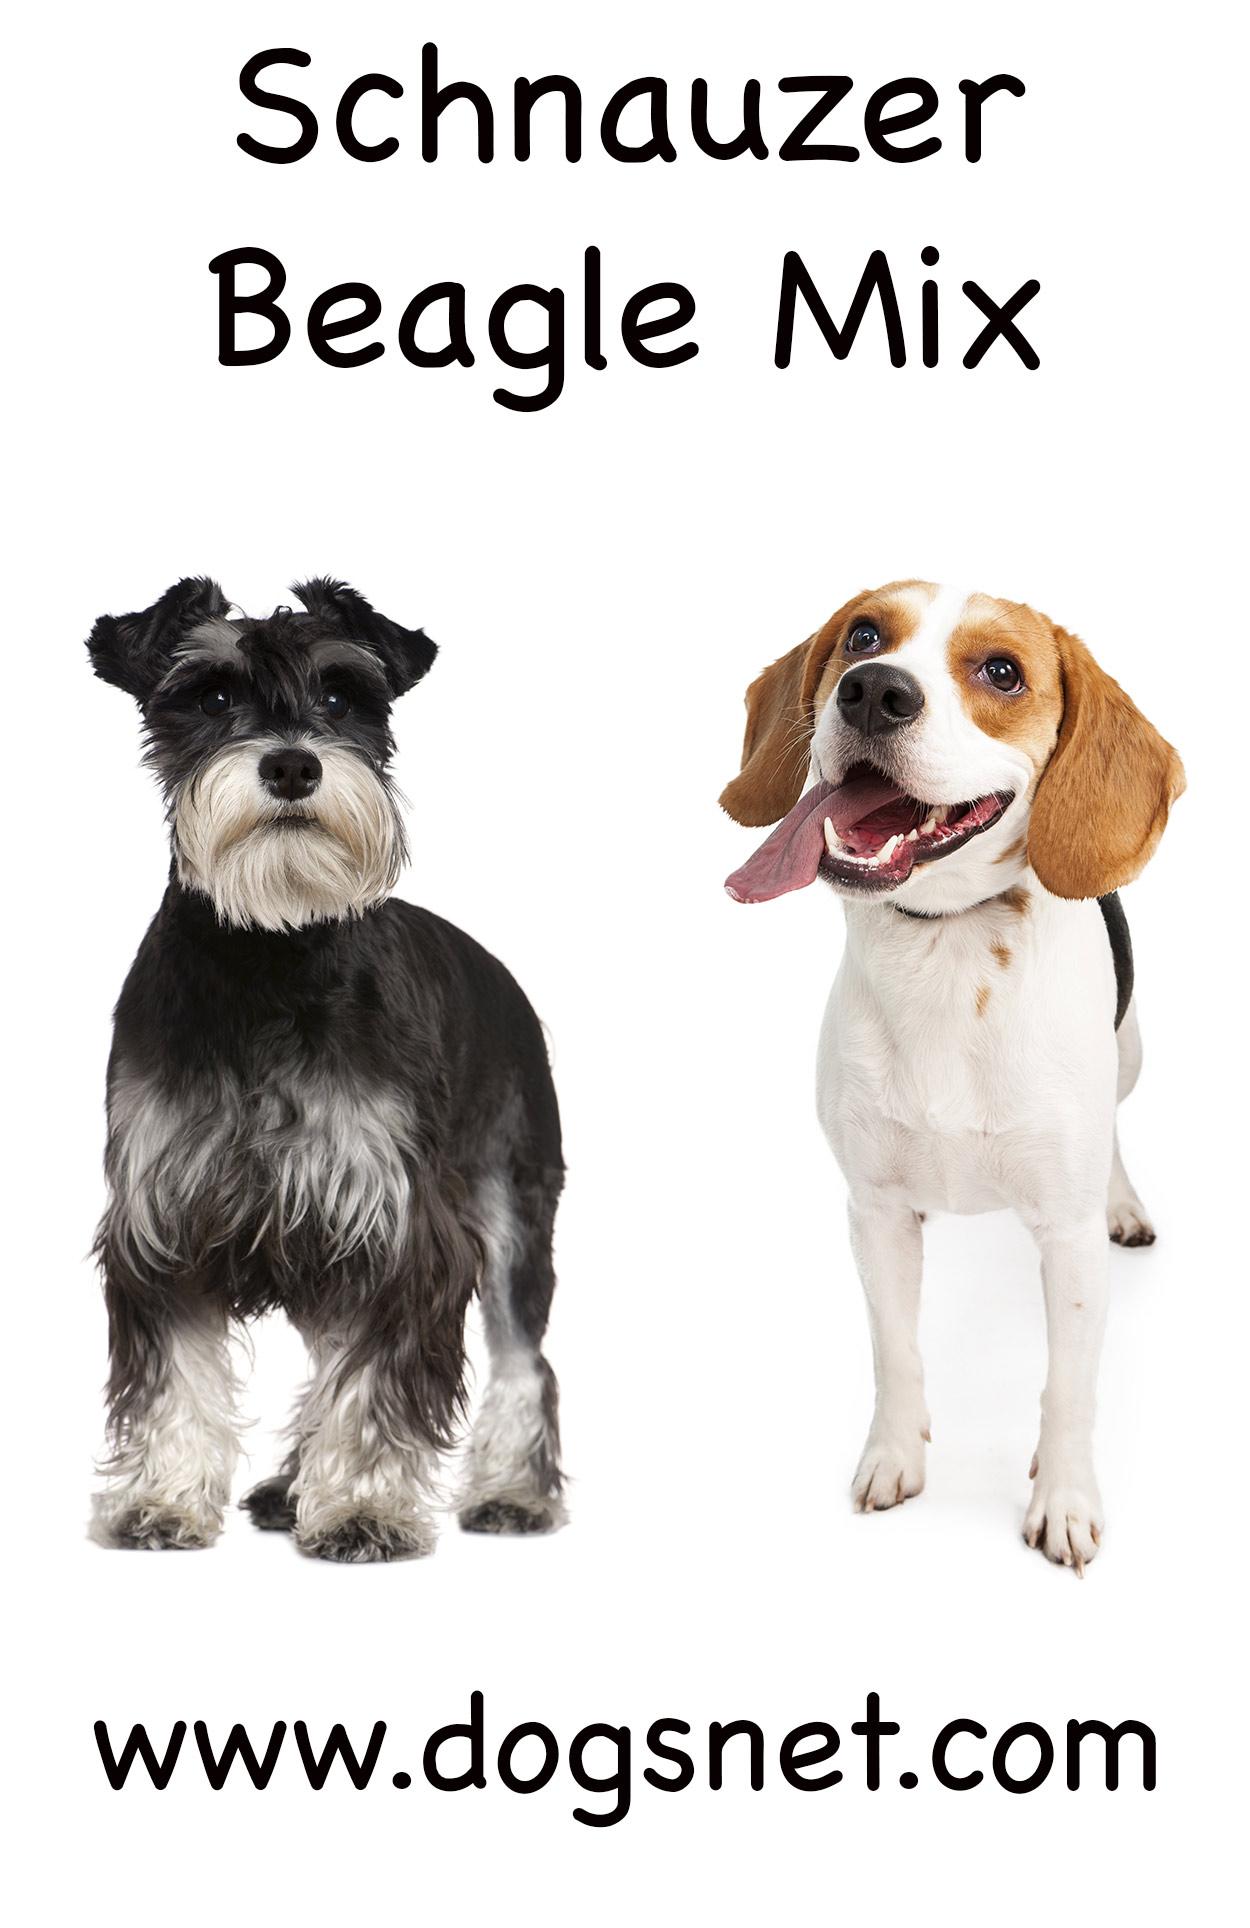 Gorgeous A Mix Miniature Schnauzer Se Two Breeds Could Result Eir Orsomething Between Schnauzer Beagle Mix Mix Traits Beagle bark post Beagle Corgi Mix